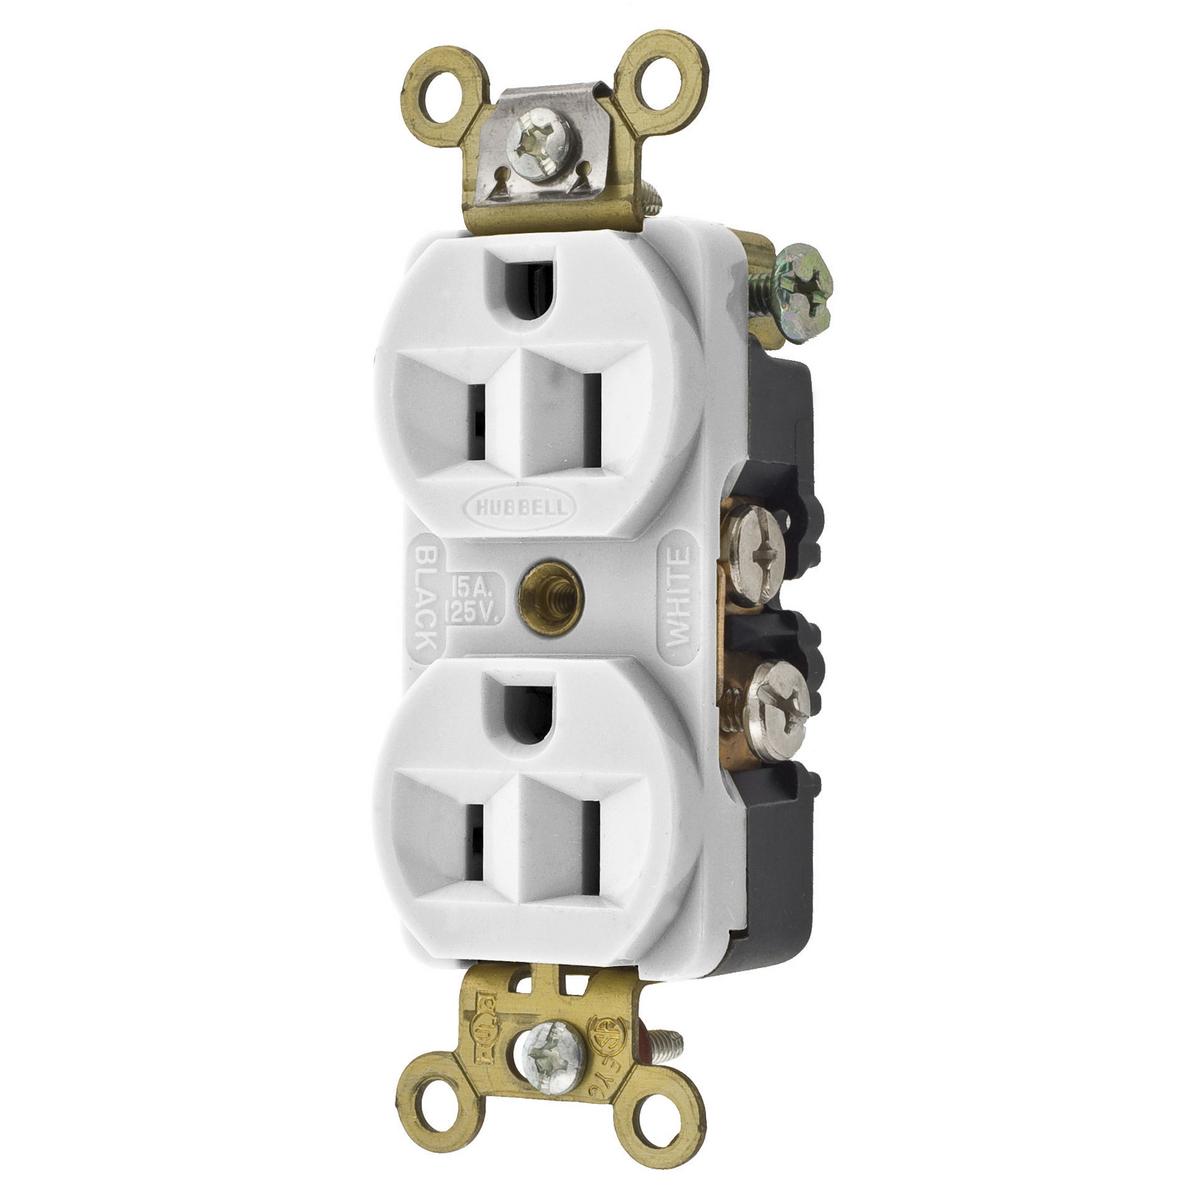 Hbl5242w Wiring Device Kellems